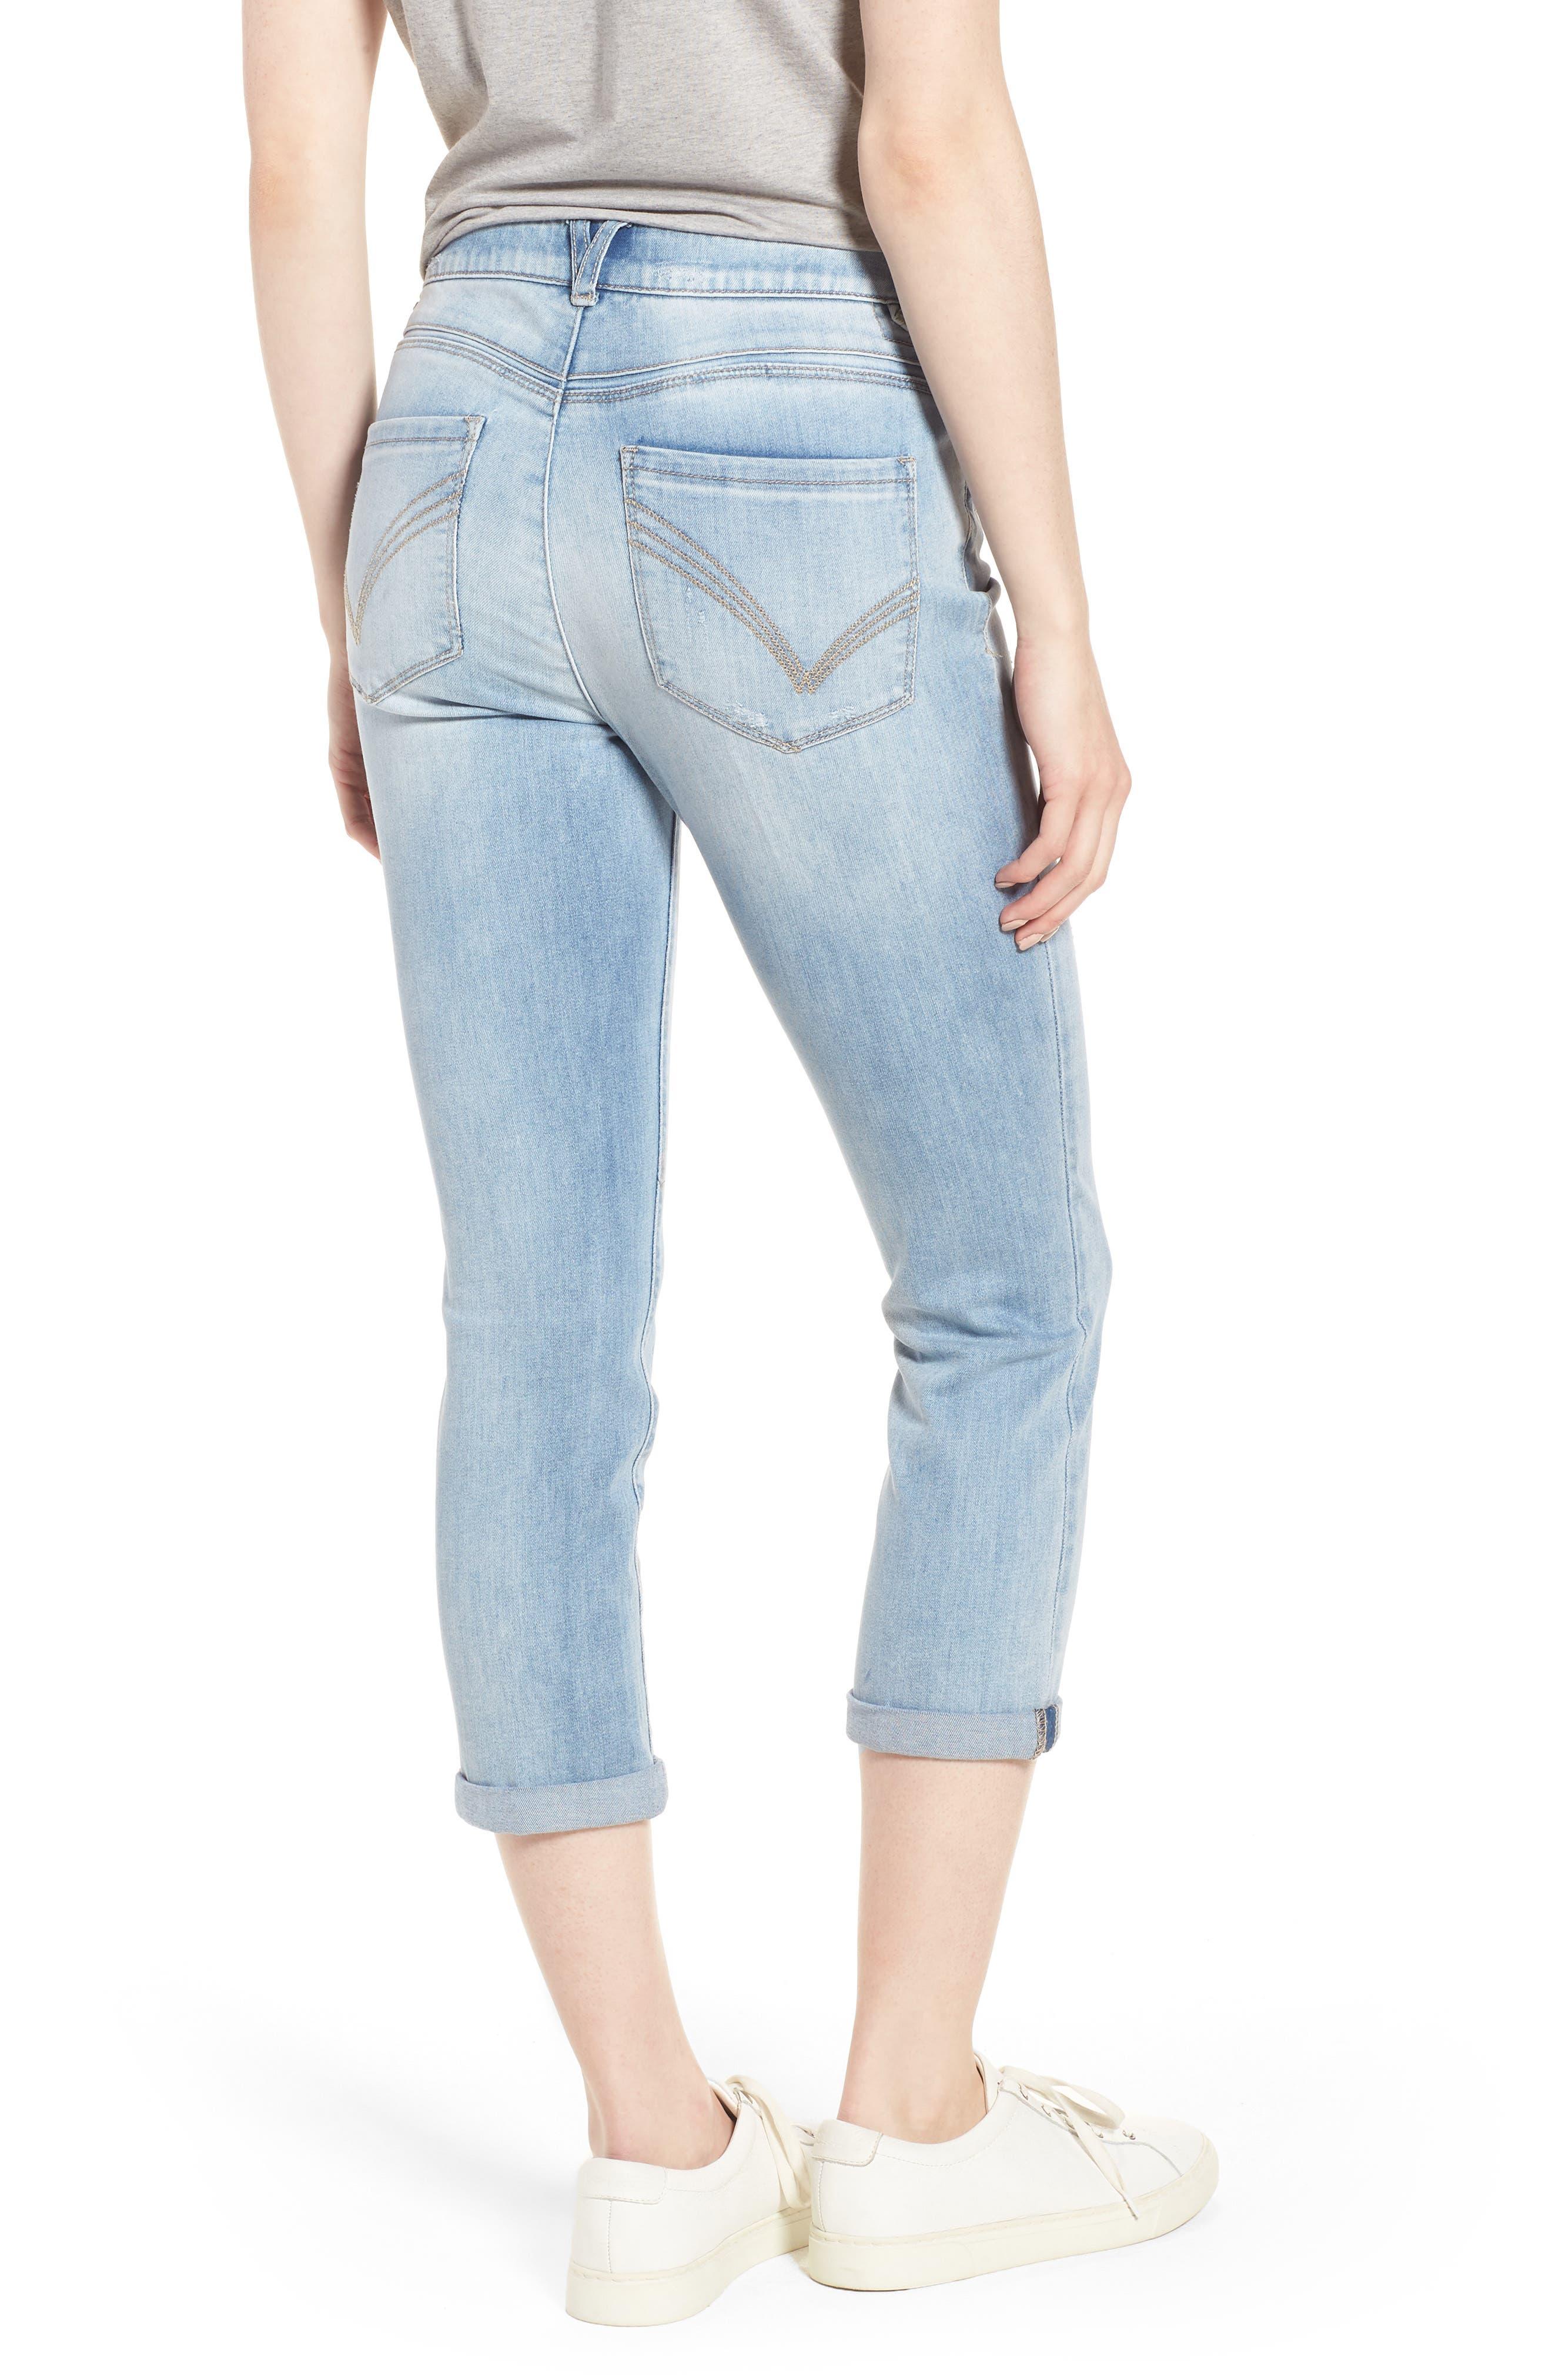 Ab-solution High Rise Crop Jeans,                             Alternate thumbnail 2, color,                             Light Blue